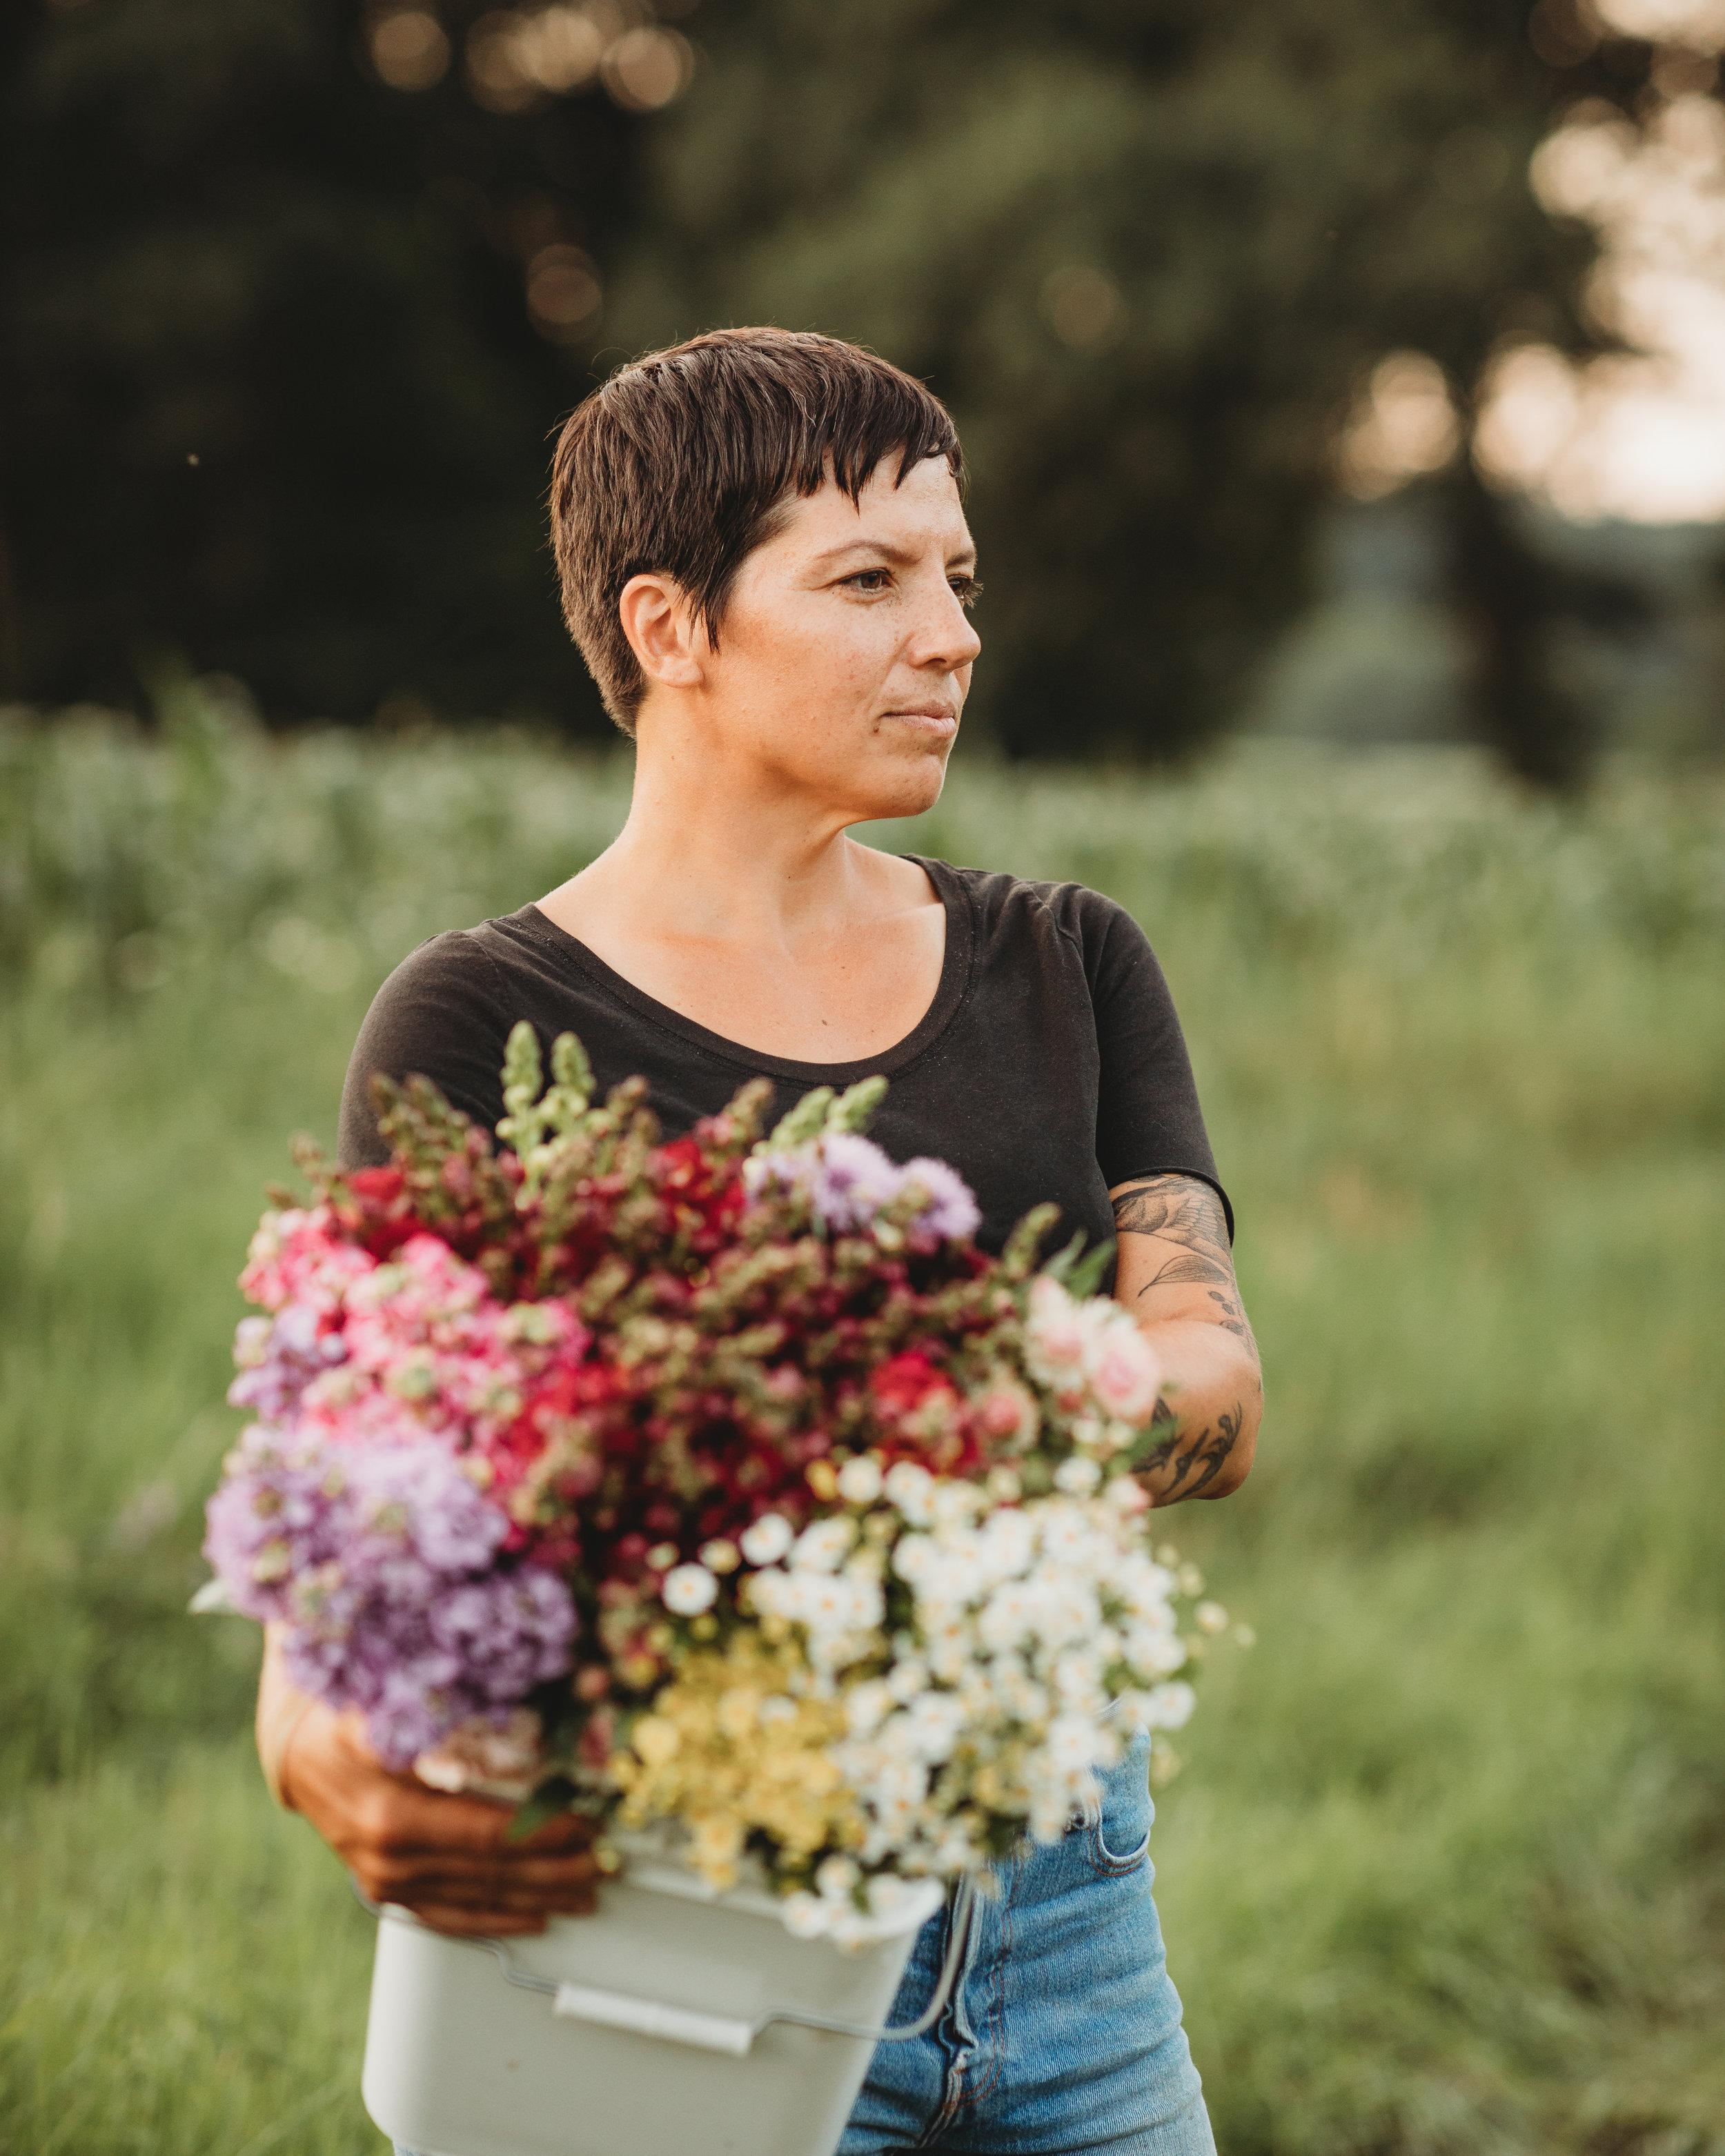 field-edge-flowers-boston-lifestyle-branding-photographer-joy-leduc-5.jpg